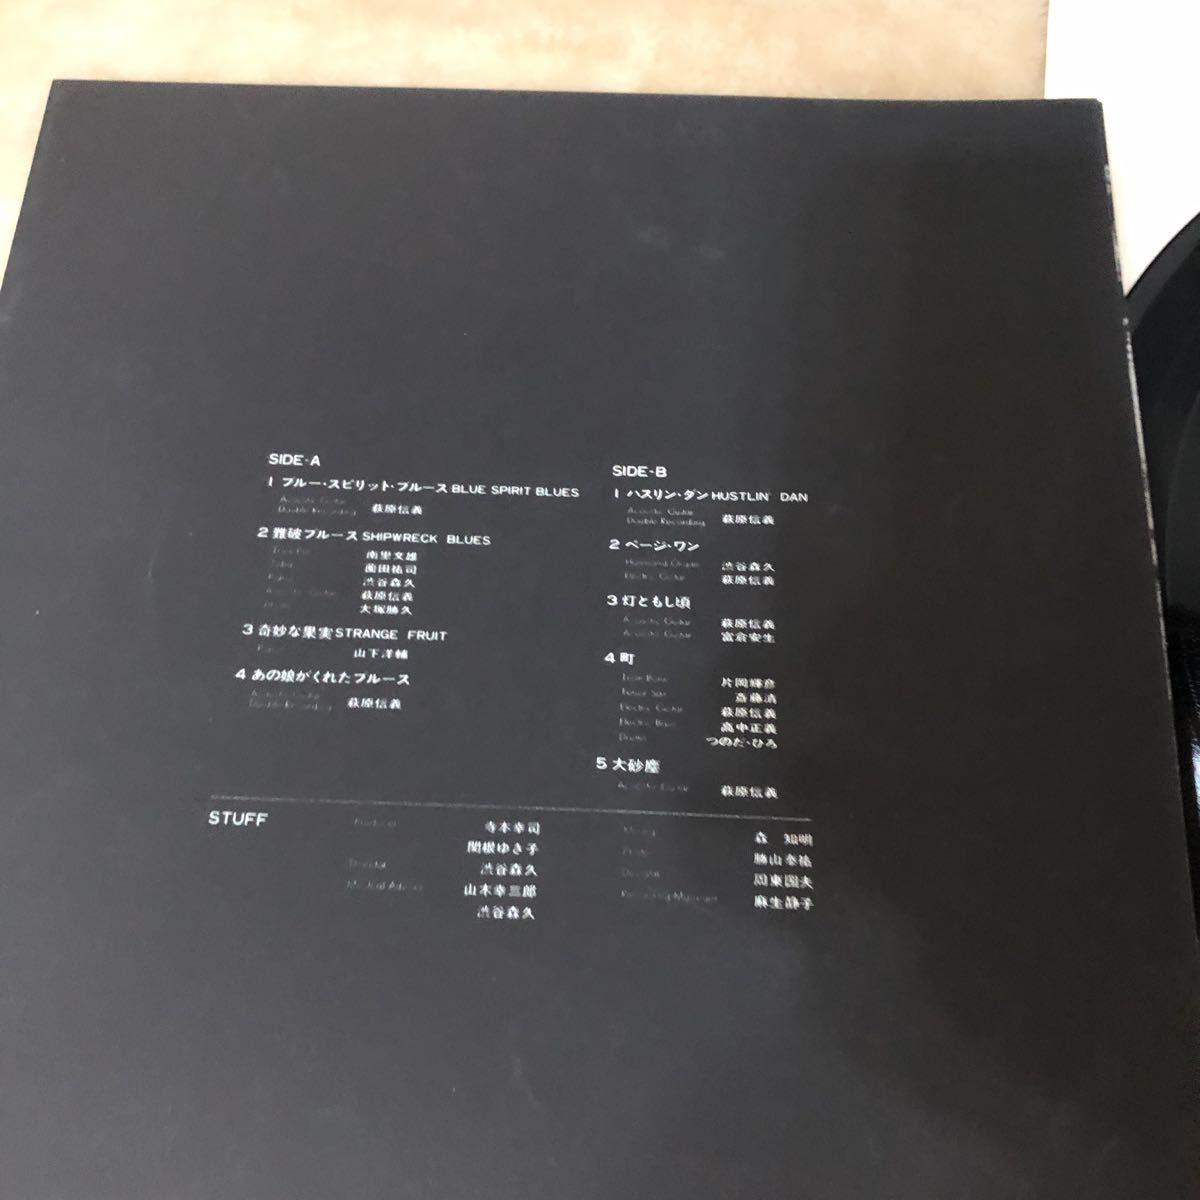 LPレコード★邦楽☆★浅川マキ★ブルースピリットブルース レコード多数出品中_画像5